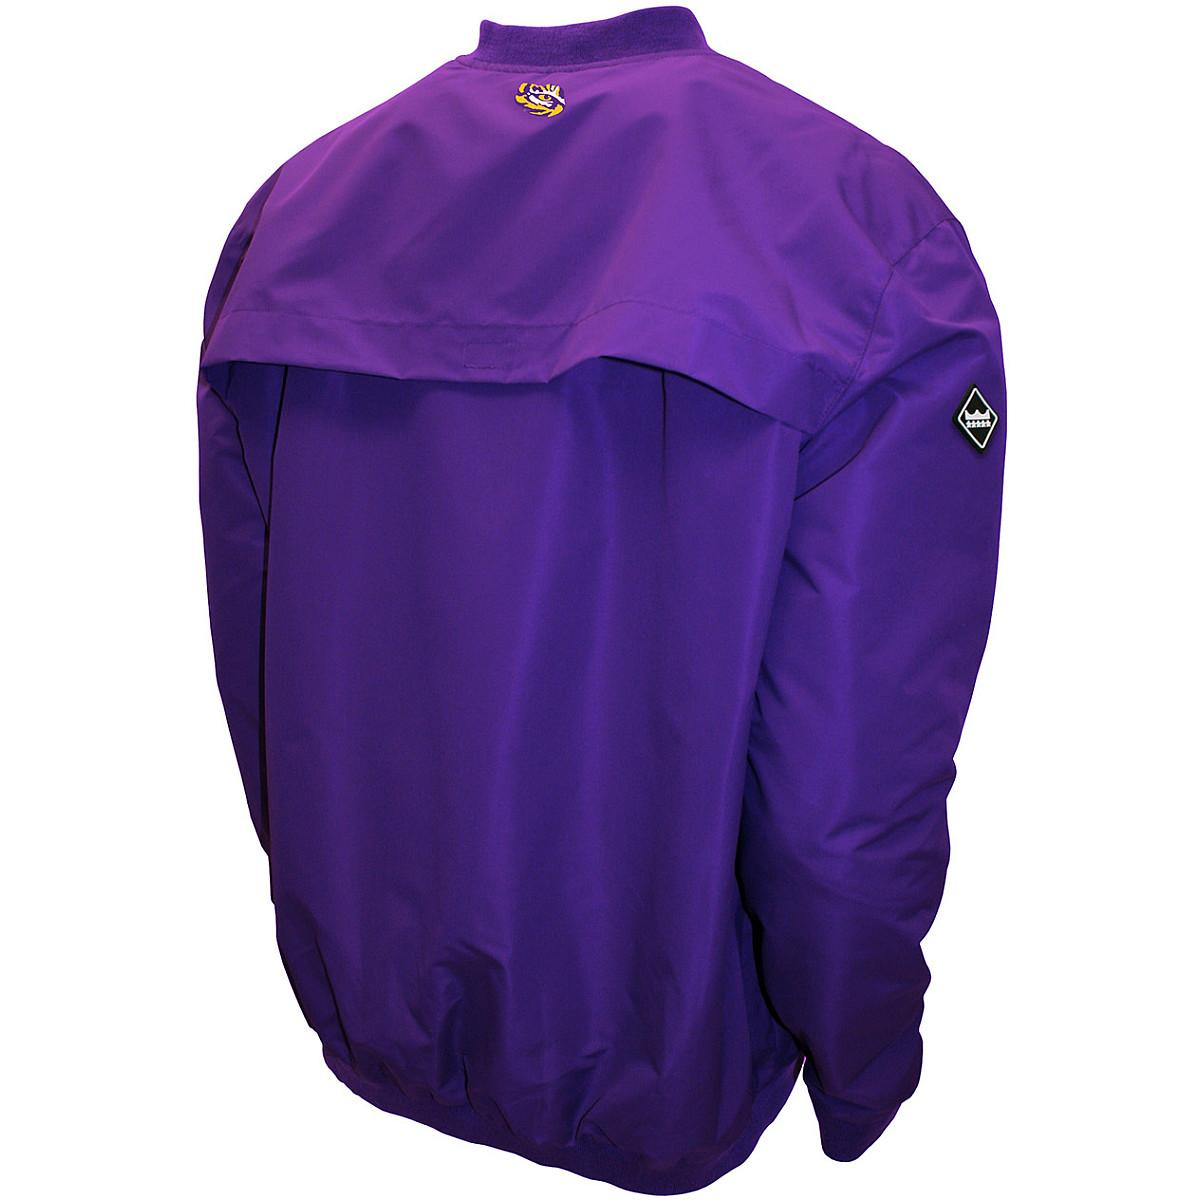 Franchise-Cub-MTC-LSU-Tigers-Men-039-s-Members-Windshell-Pullover-Jacket thumbnail 6